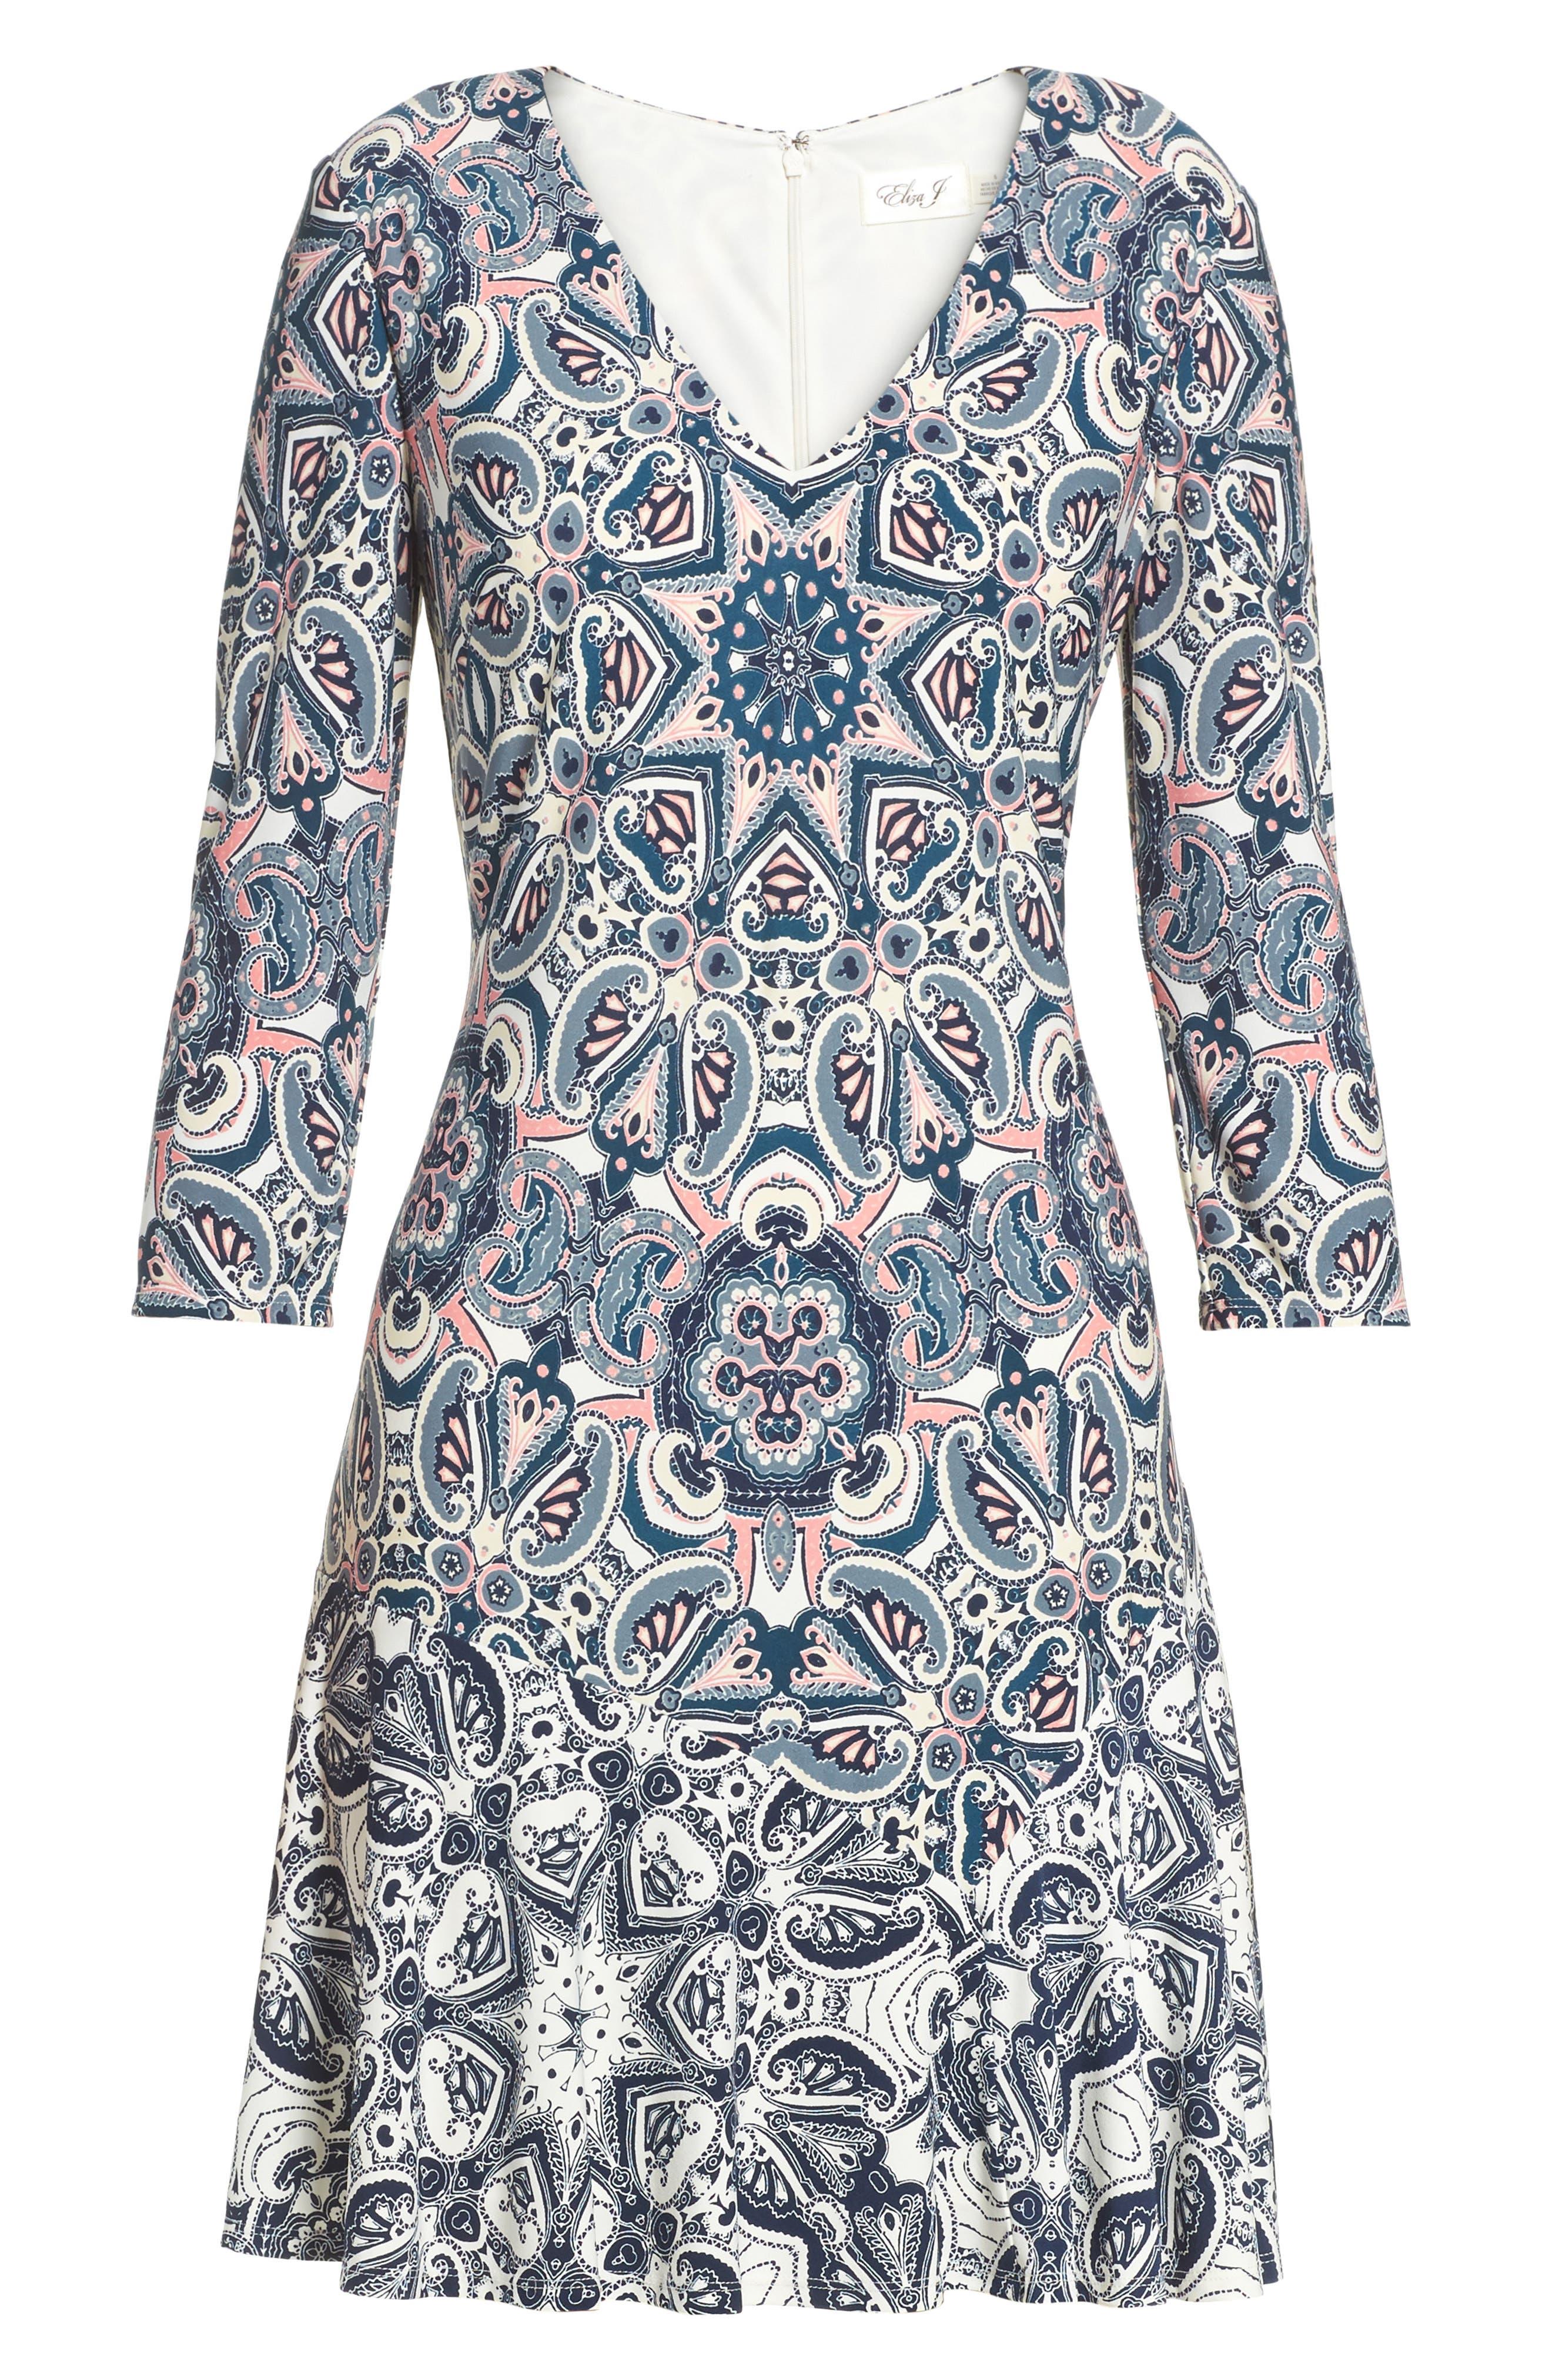 ELIZA J,                             Print Knit A-Line Dress,                             Alternate thumbnail 7, color,                             TEAL